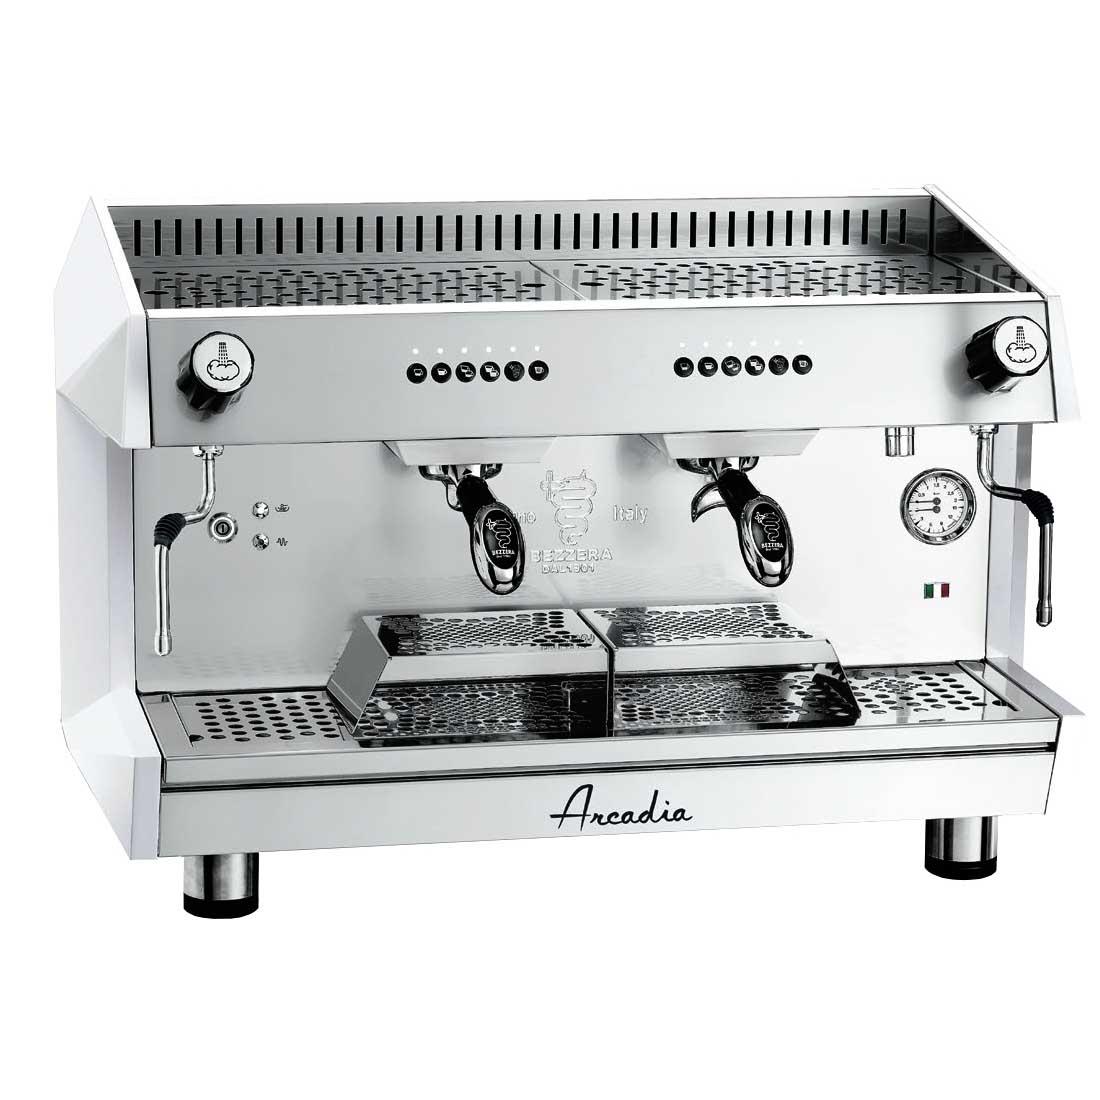 ARCADIA Professional Espresso coffee machine SS polish white 2 Group - ARCADIA-G2